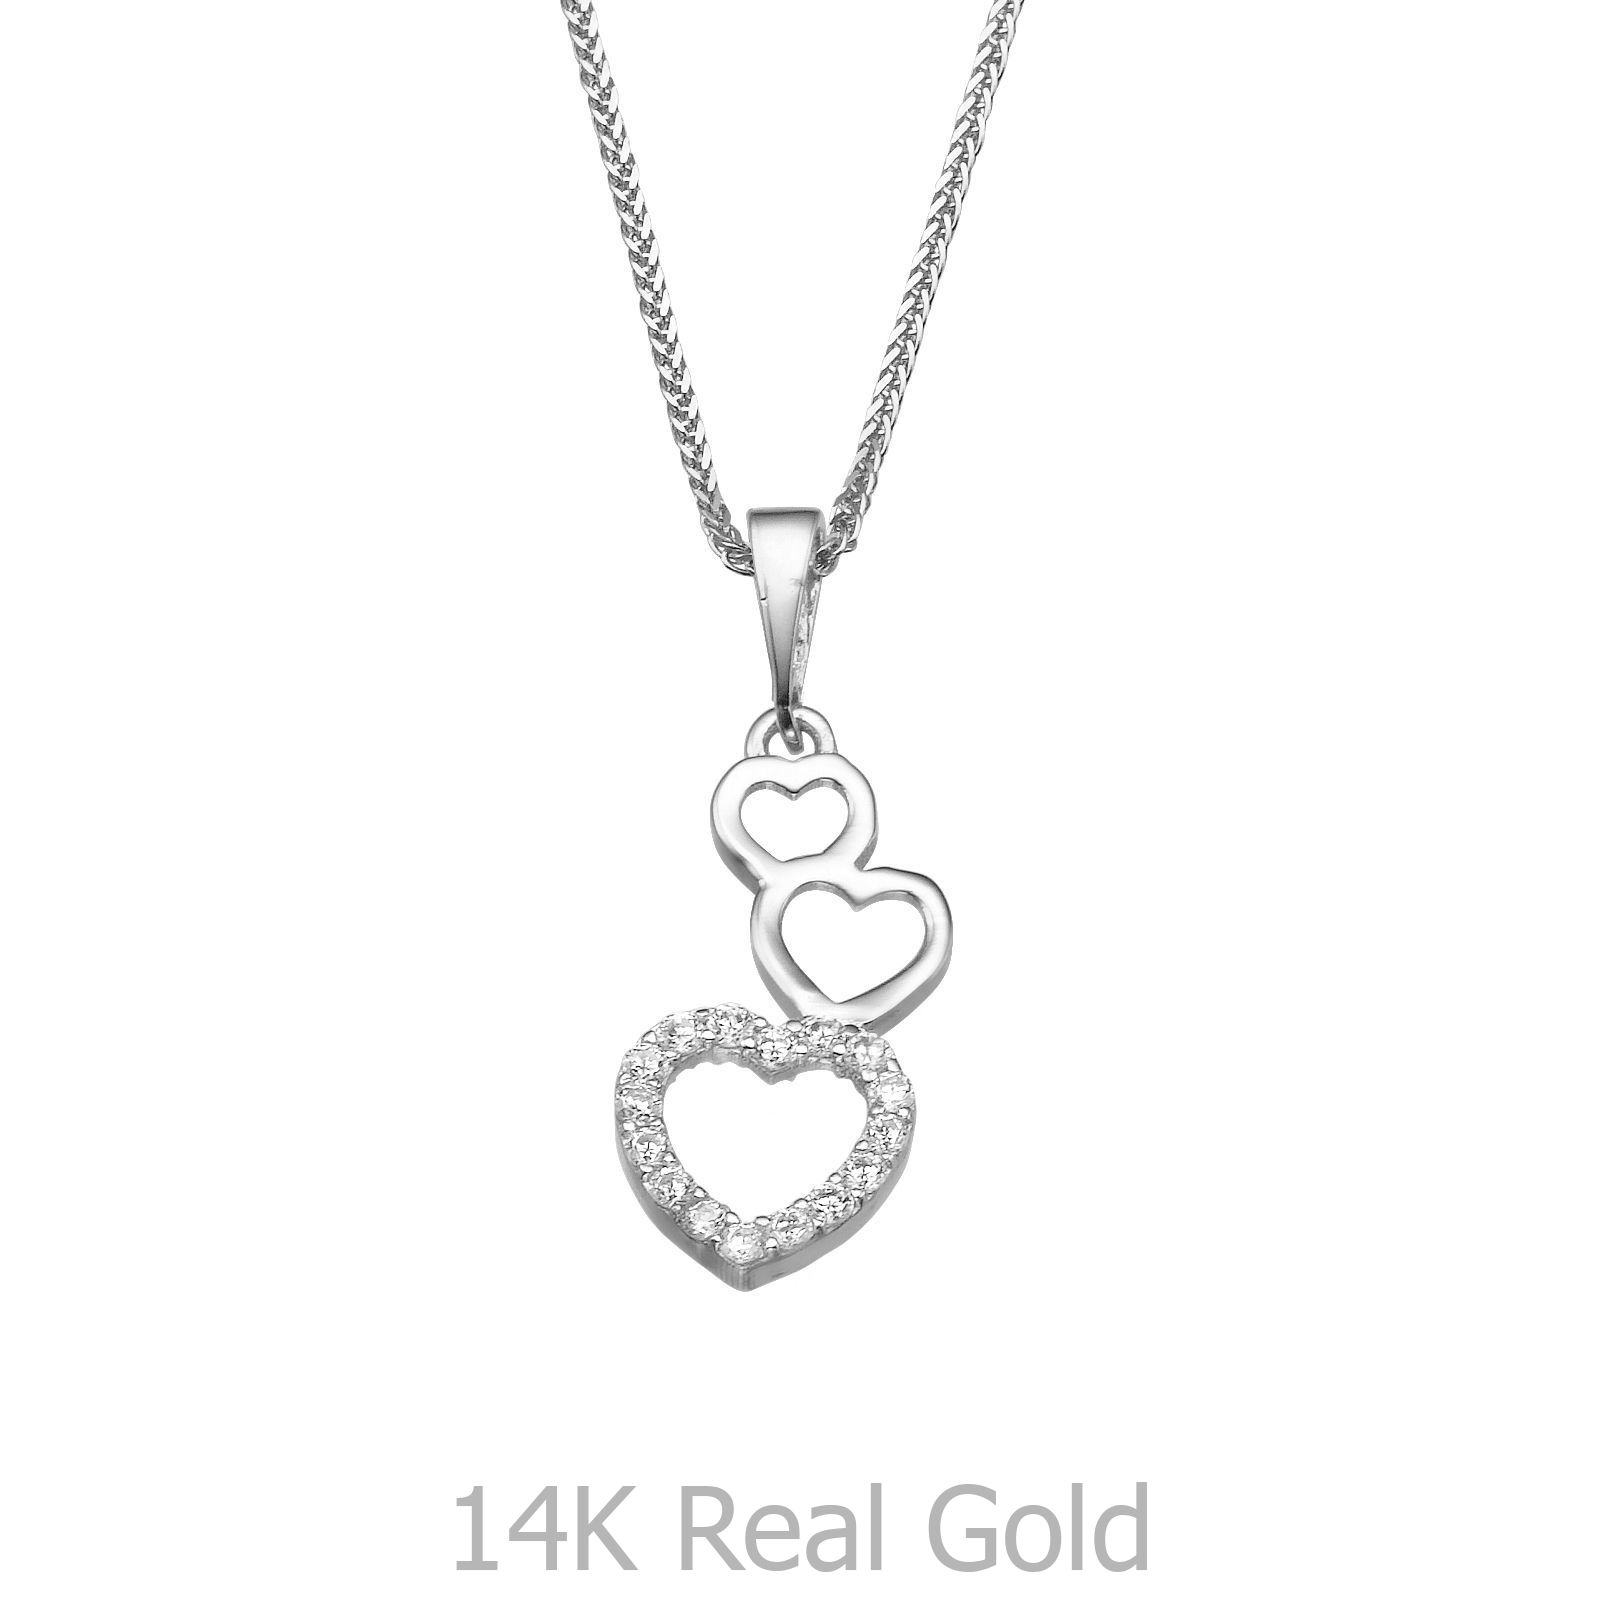 Heart of alma cz pendant for womenteengirls 14k white gold labor sm img aloadofball Images